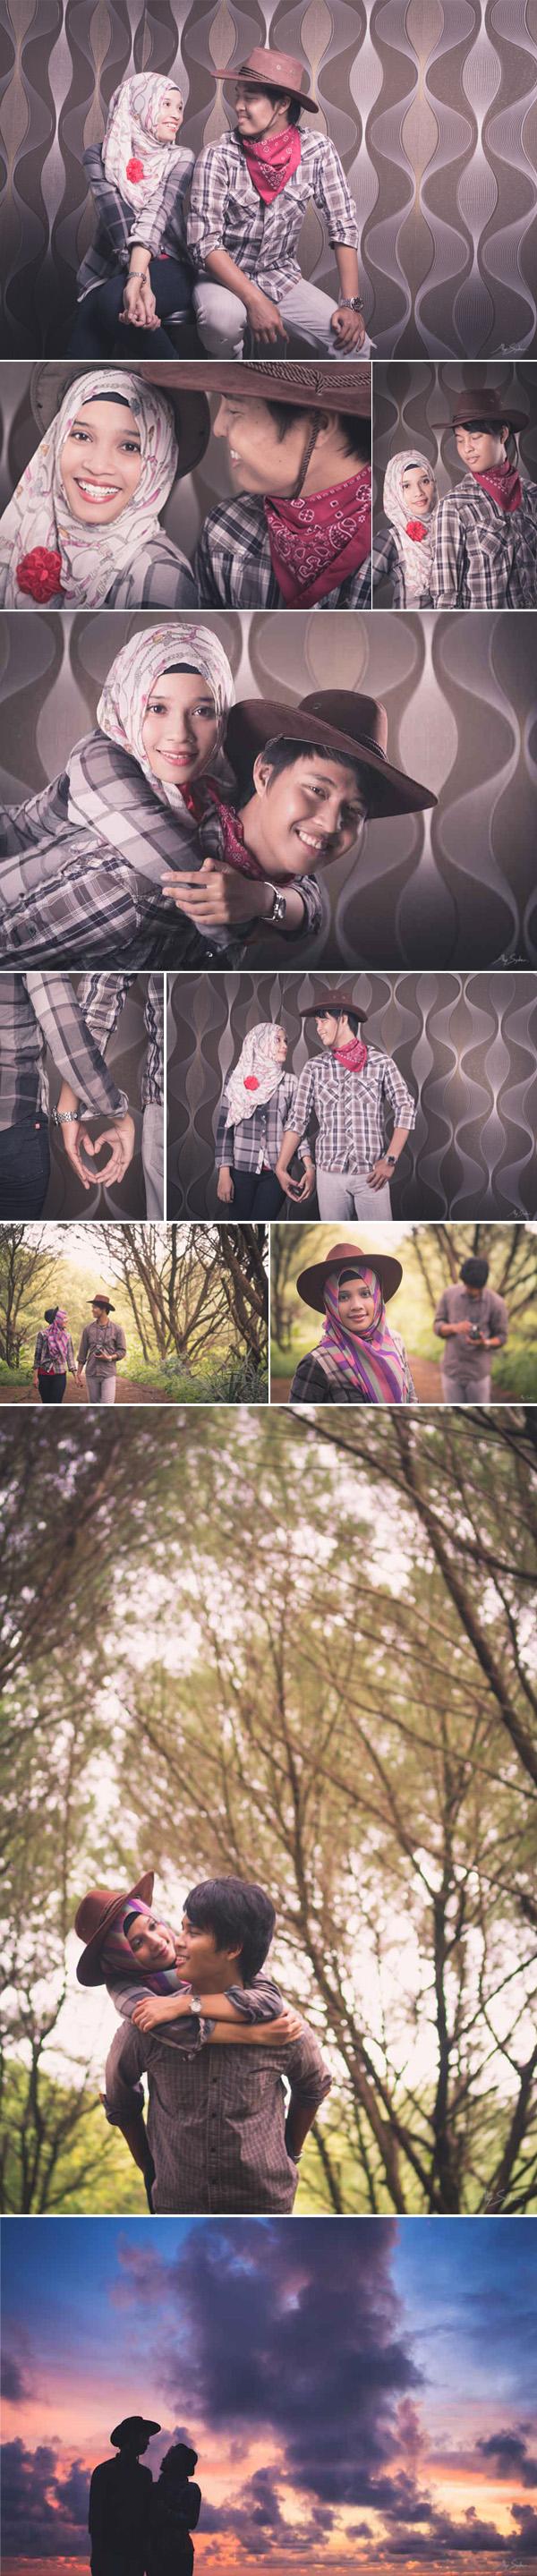 Yogyakarta Prewedding - Aliy Photography - Jogja Prewedding Photographer